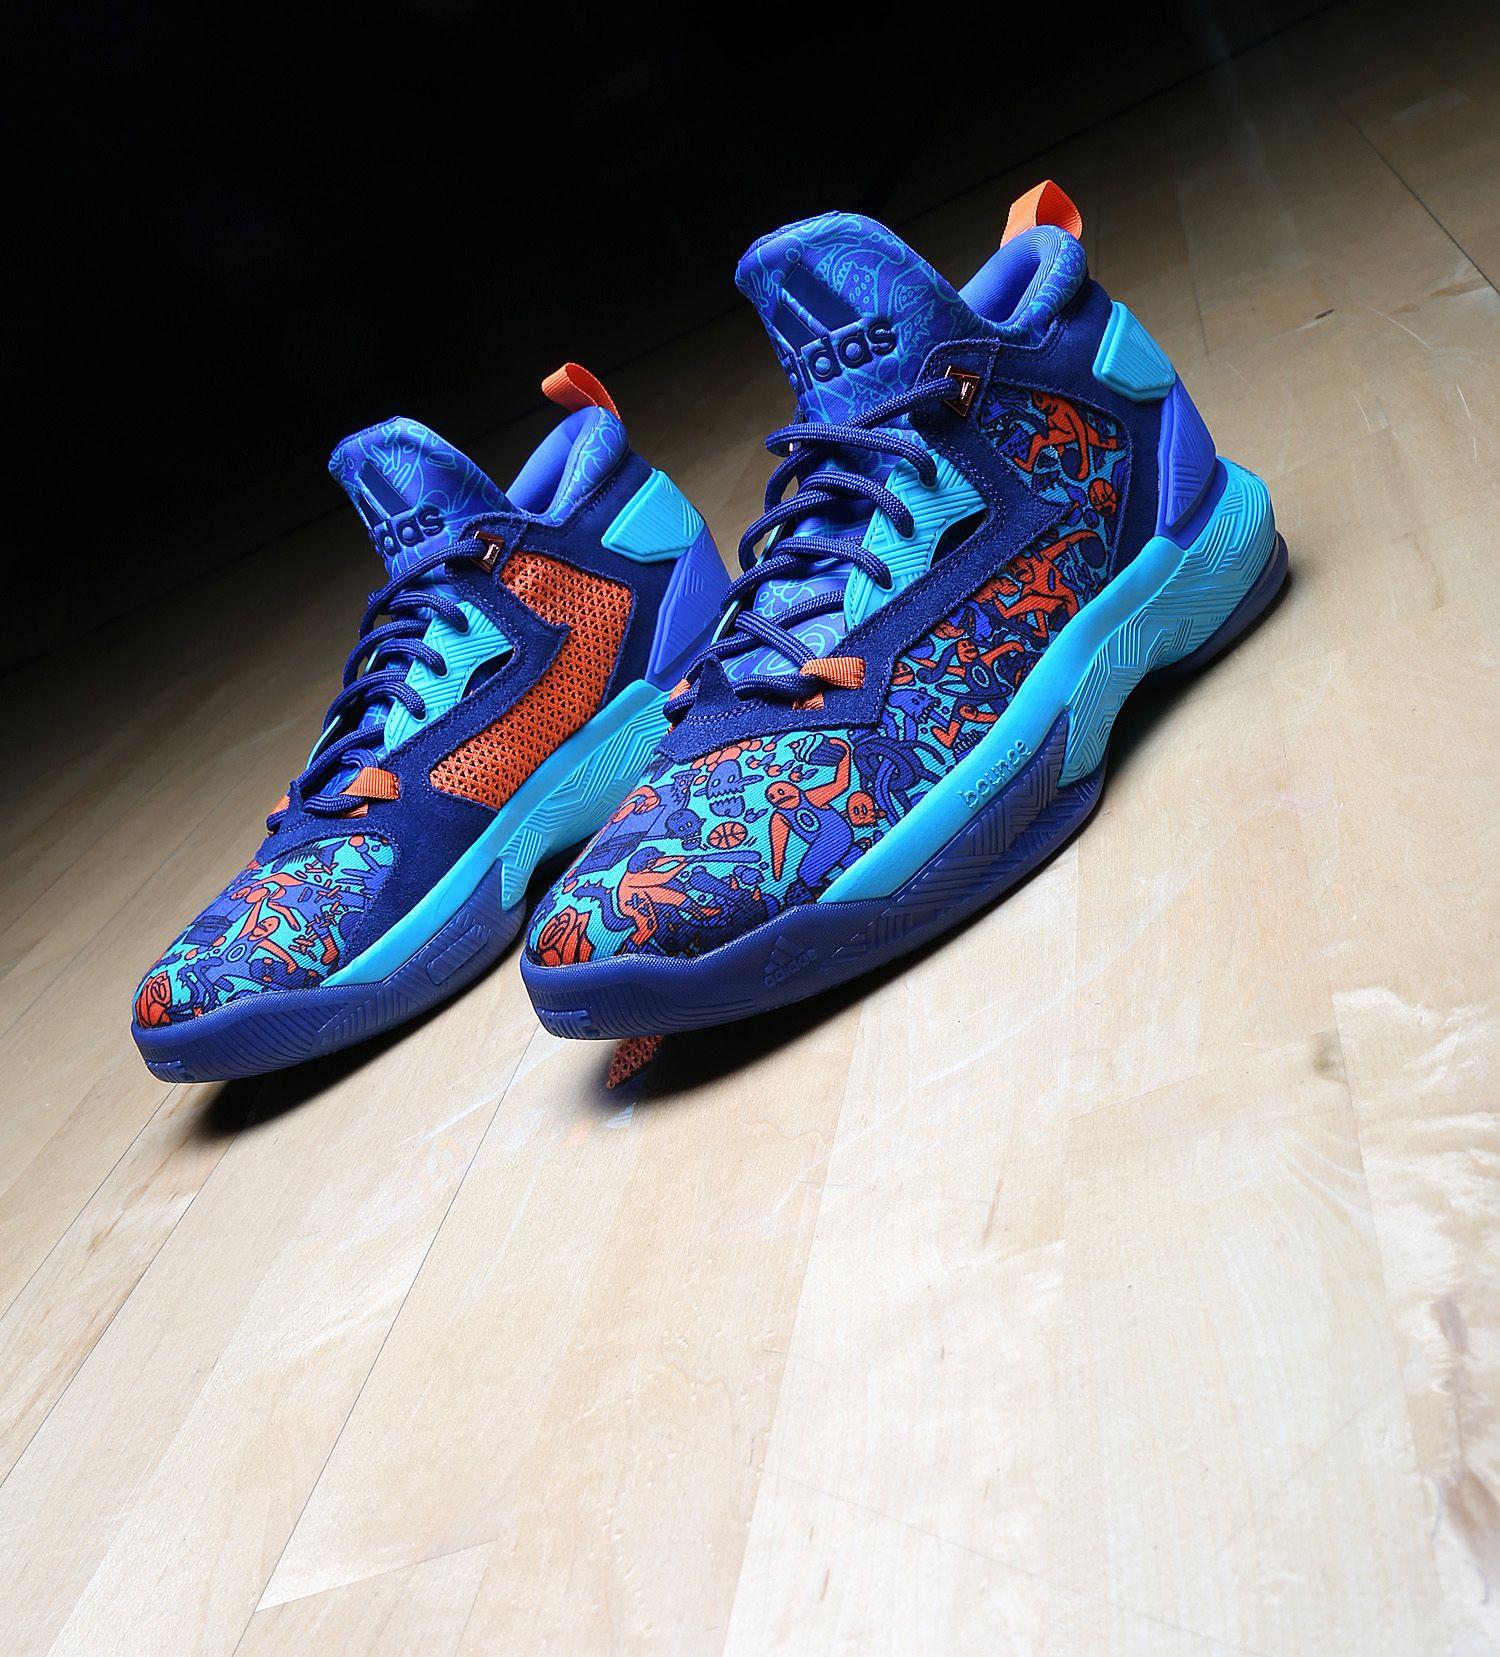 sports shoes cb1a6 b7930 Damian Lillard Camp adidas DLillard 1